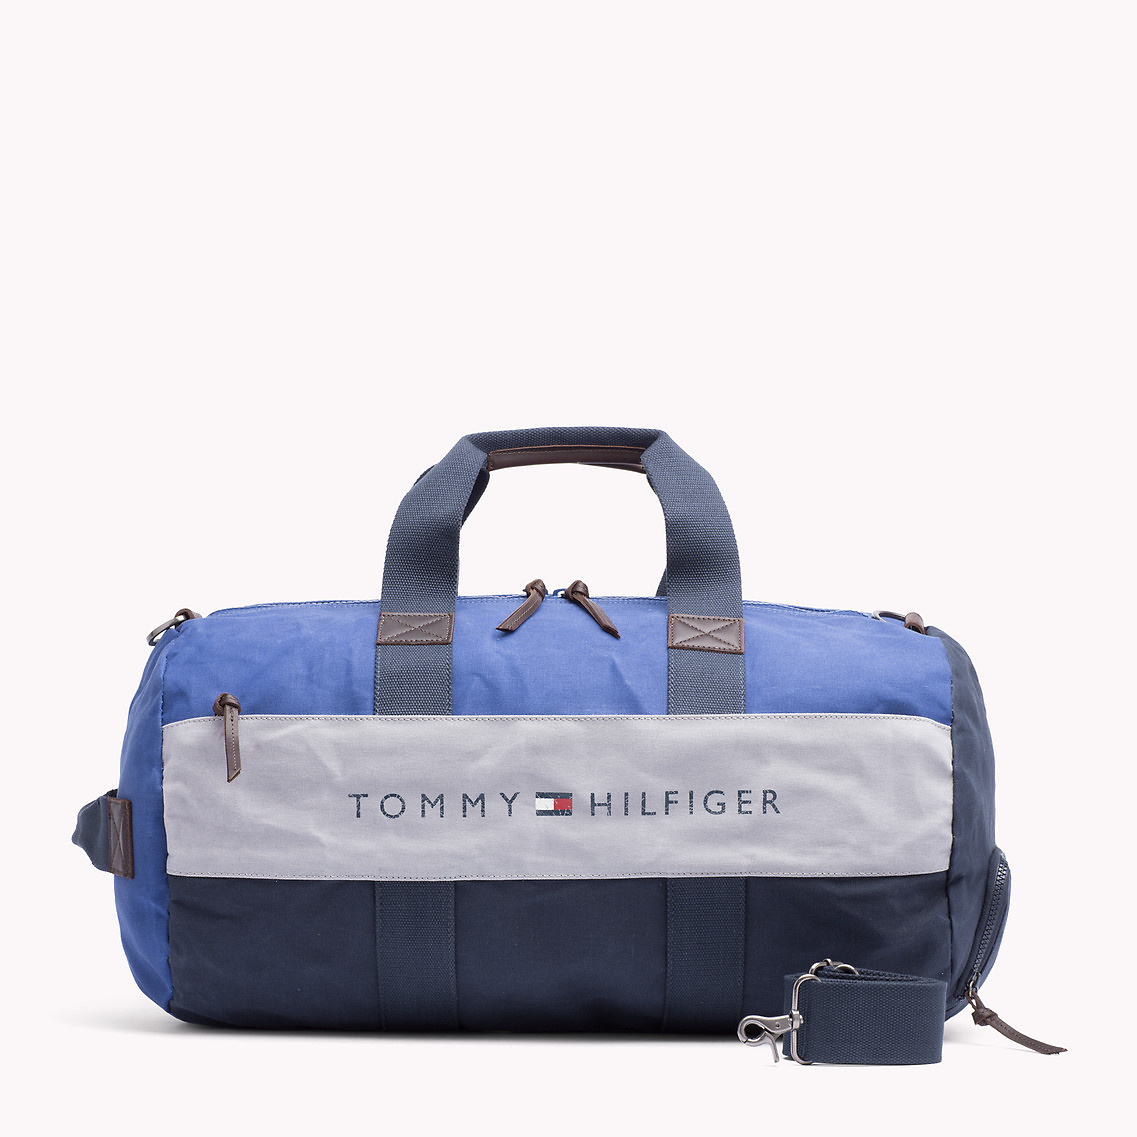 Tommy Hilfiger Small Duffle Bag Size   ReGreen Springfield 34c909366b